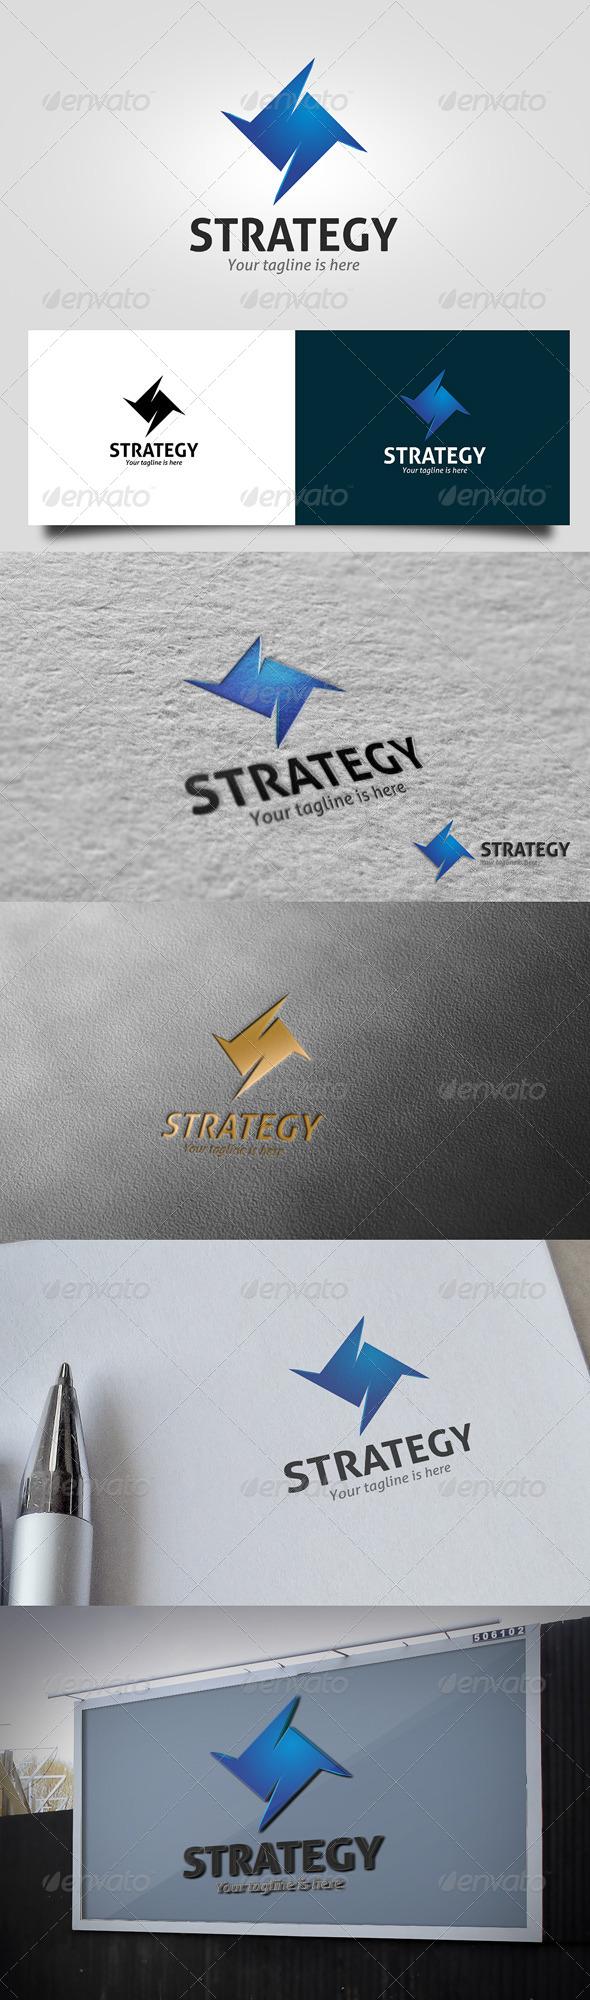 GraphicRiver Strategy Logo 6419281